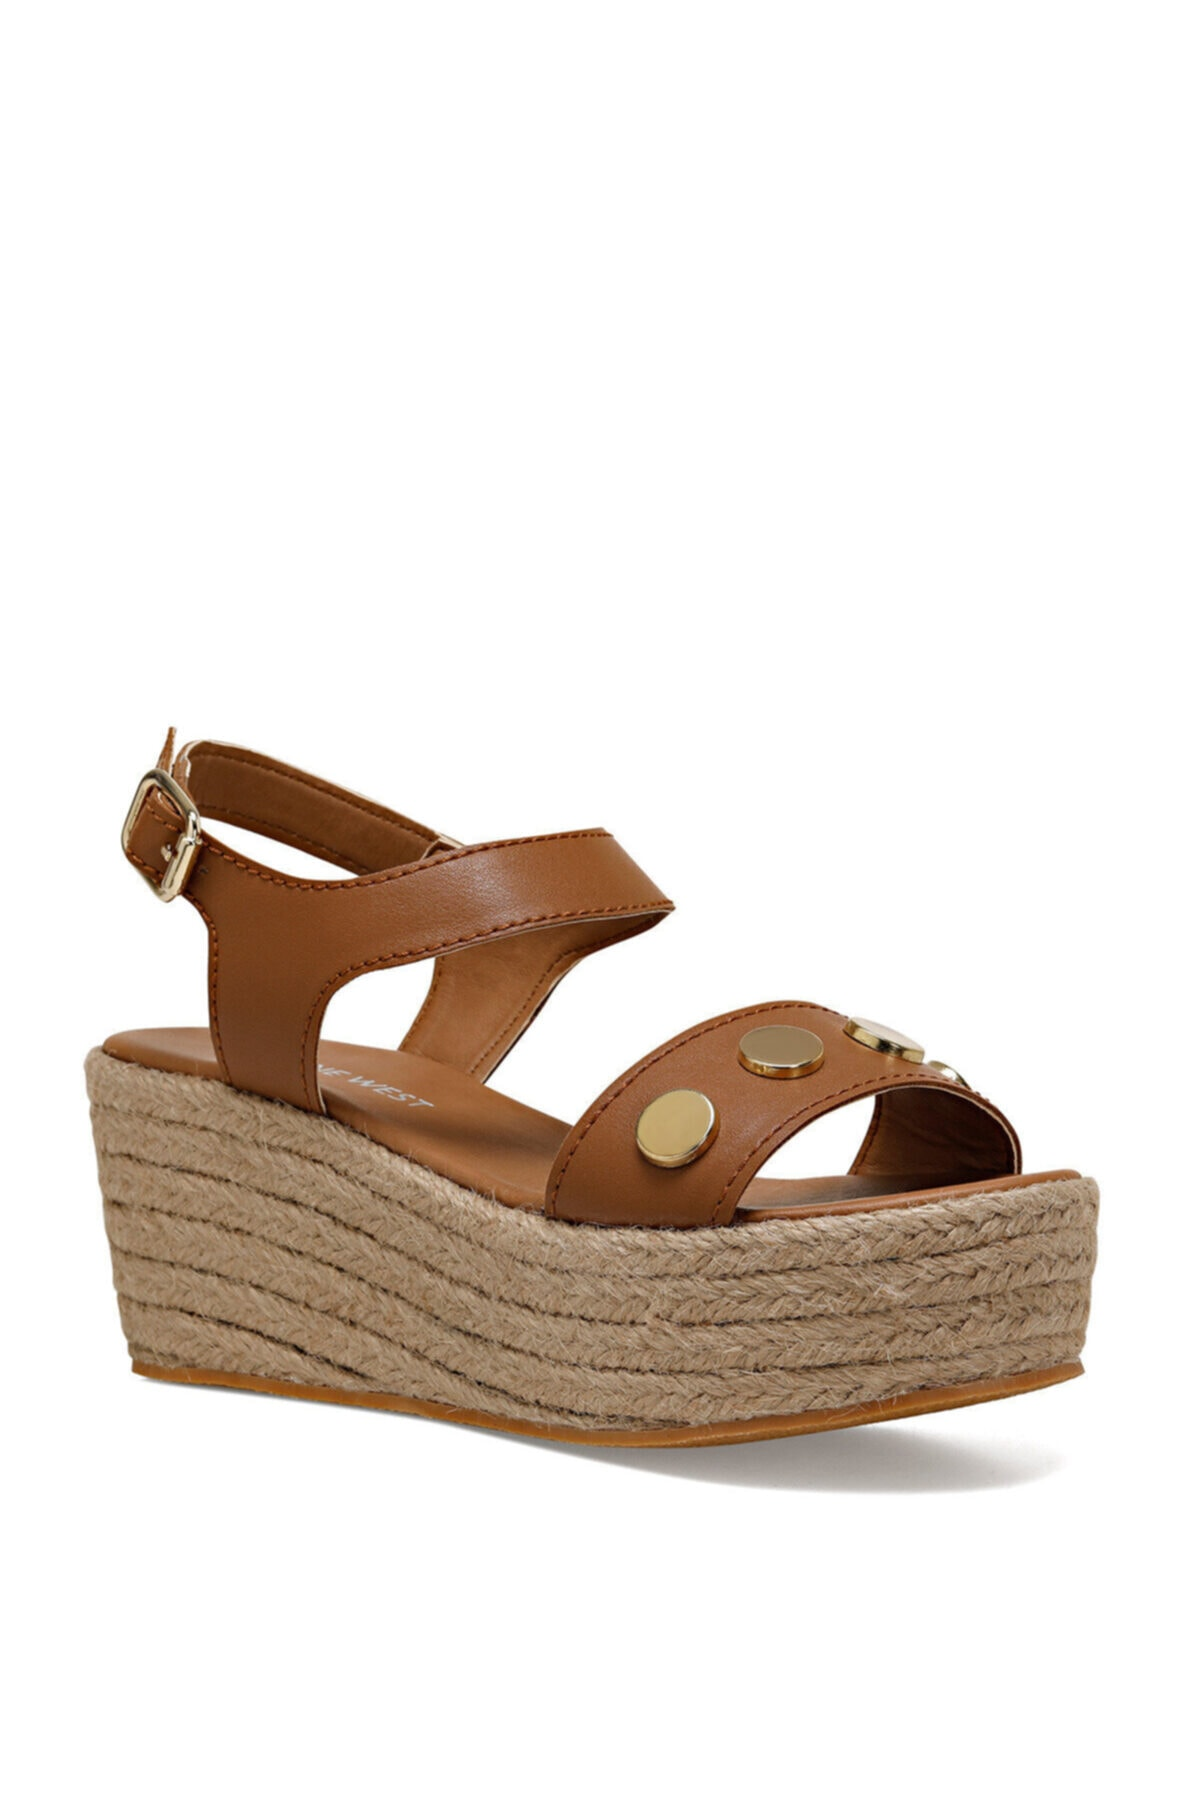 Nine West VALADON Taba Kadın Dolgu Topuklu Sandalet 100526221 2